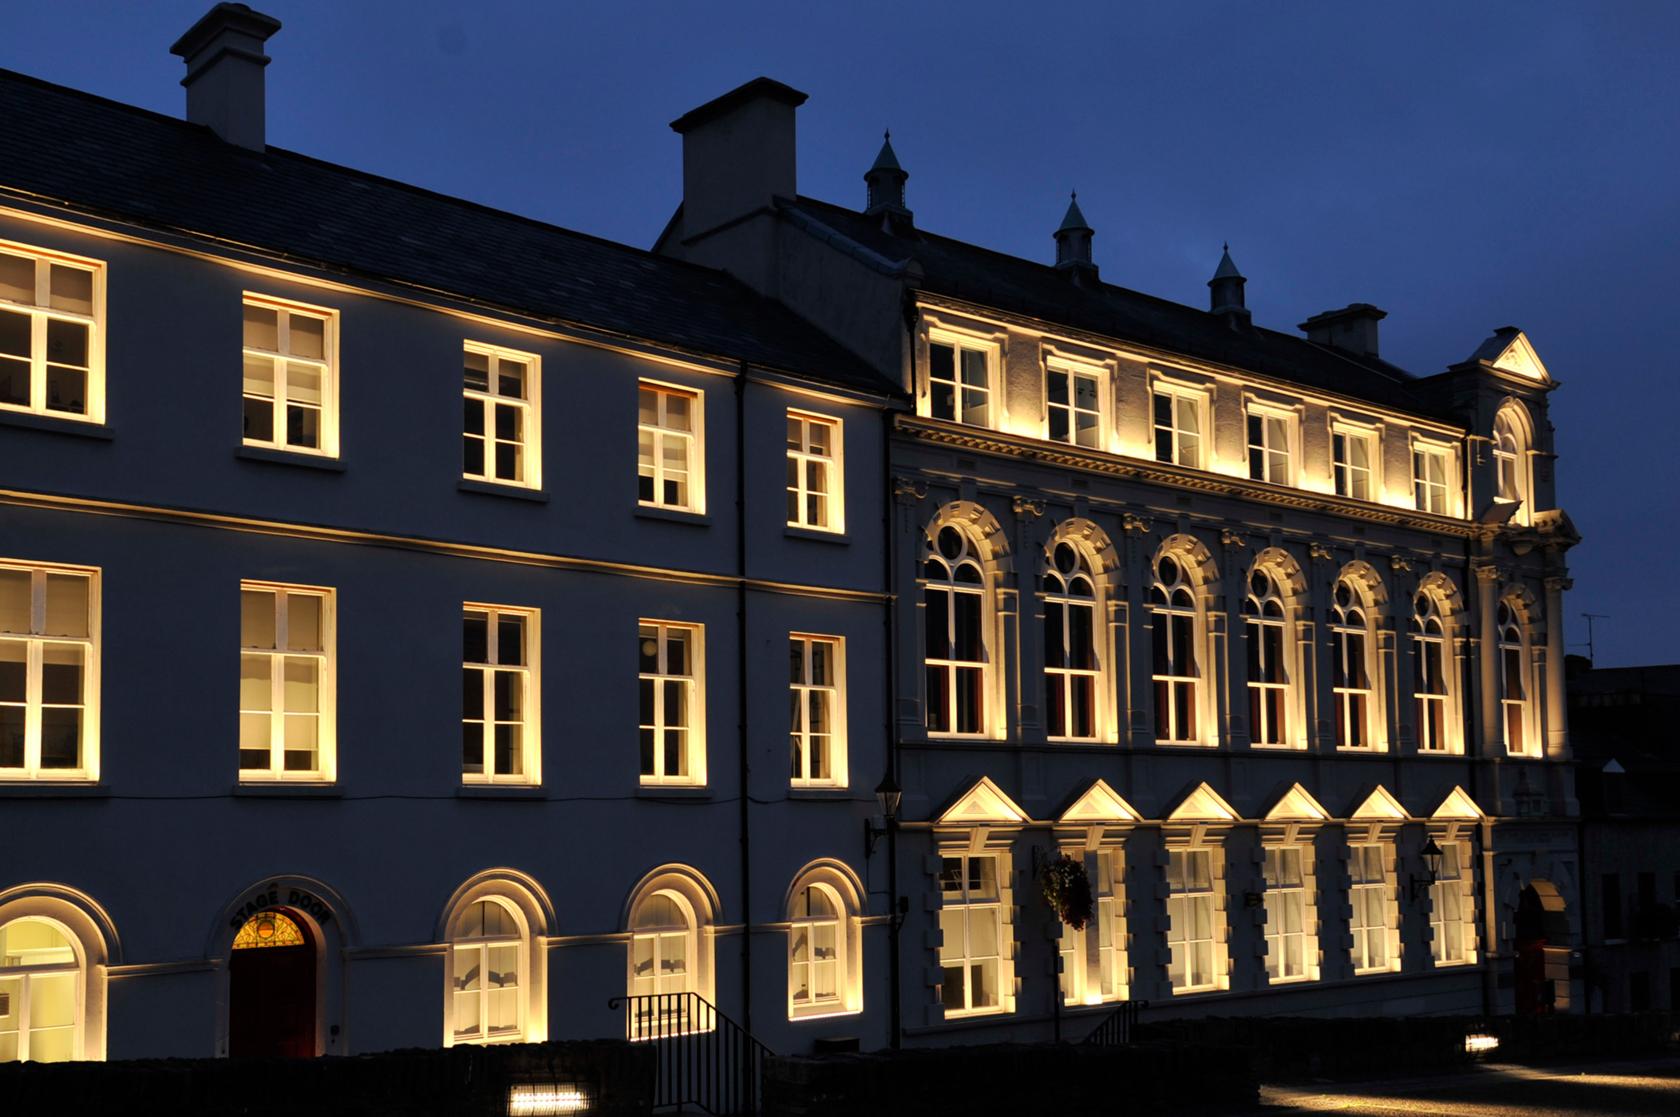 Пример освещения окон на фасаде здания